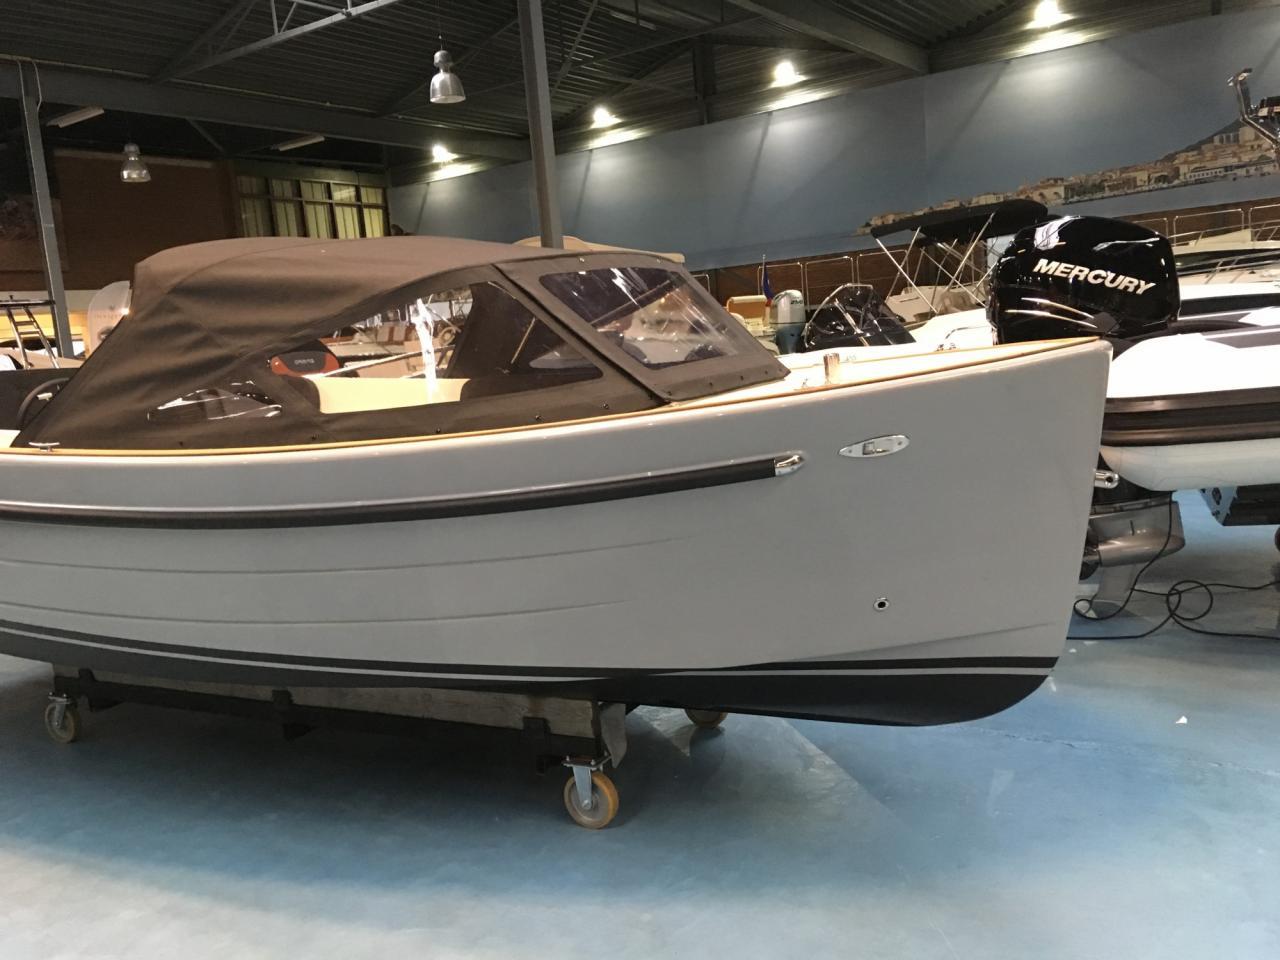 Antaris sixty6 grijs met 42 pk Vetus 2